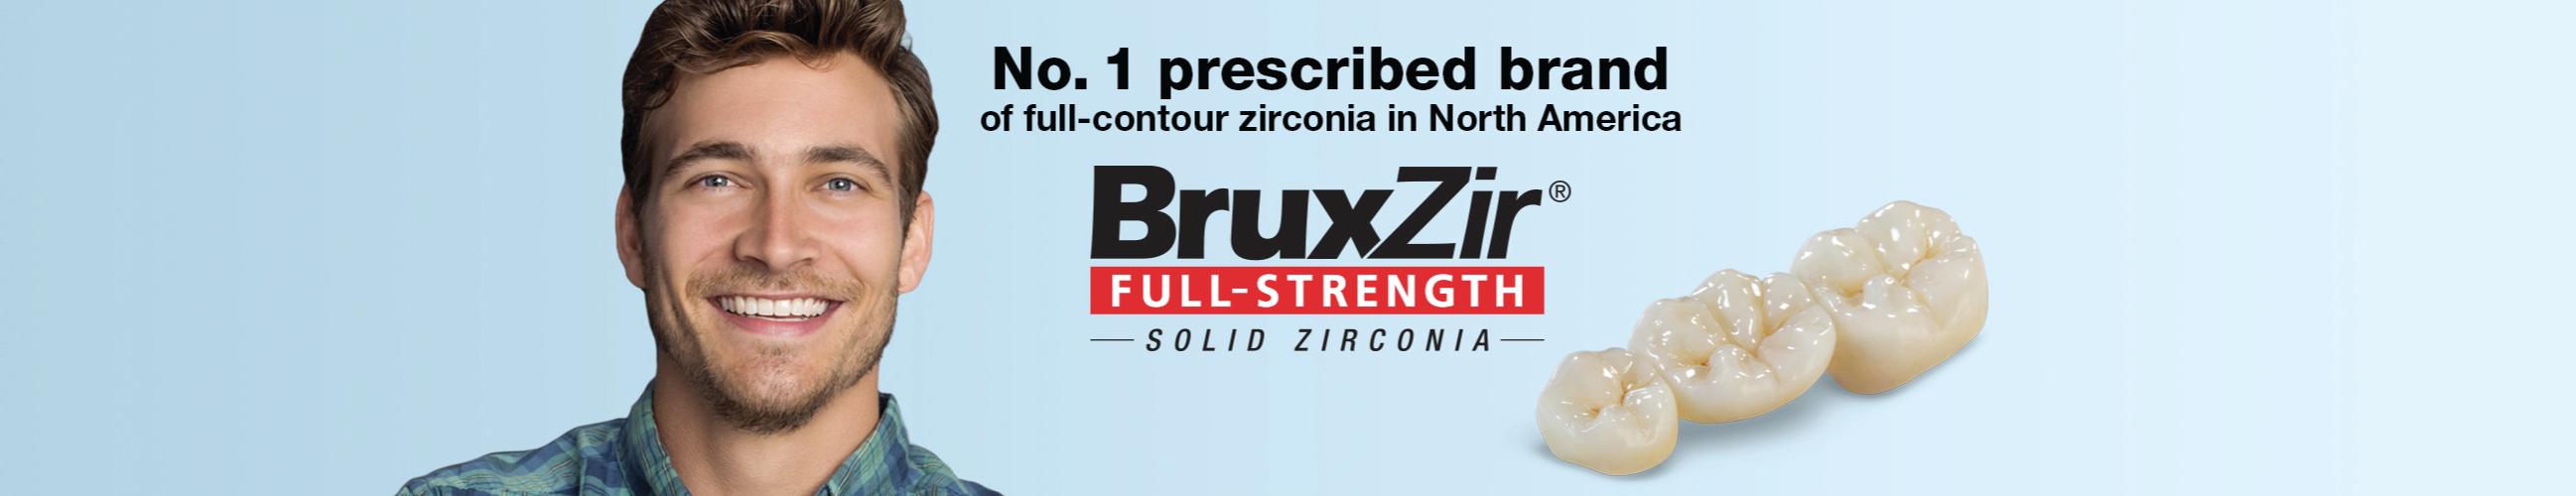 bruxzir-full-strength-solid-zirconia